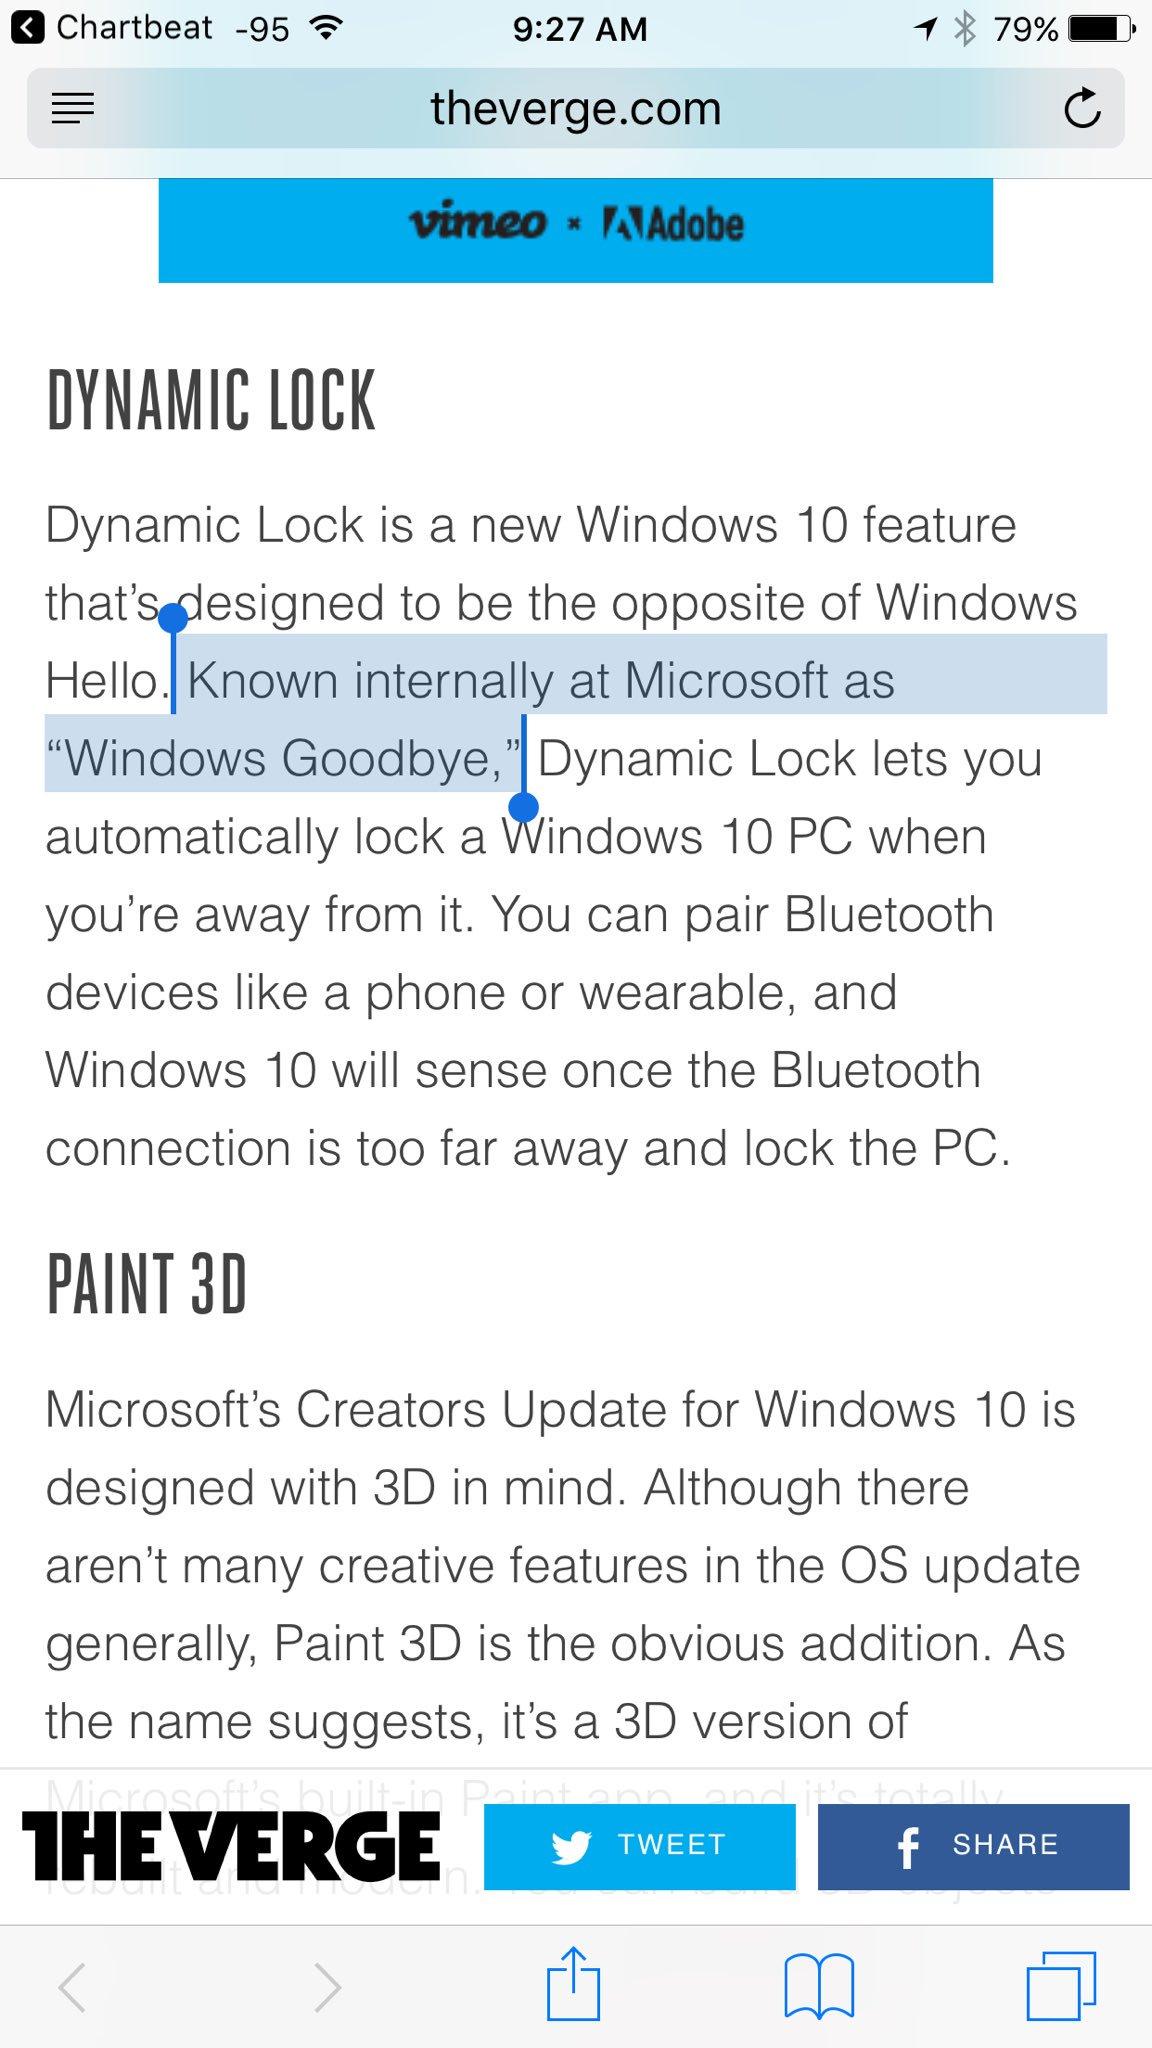 They should have definitely named this feature Windows Goodbye https://t.co/jvWECNwrXp https://t.co/tXM3kJbfEp